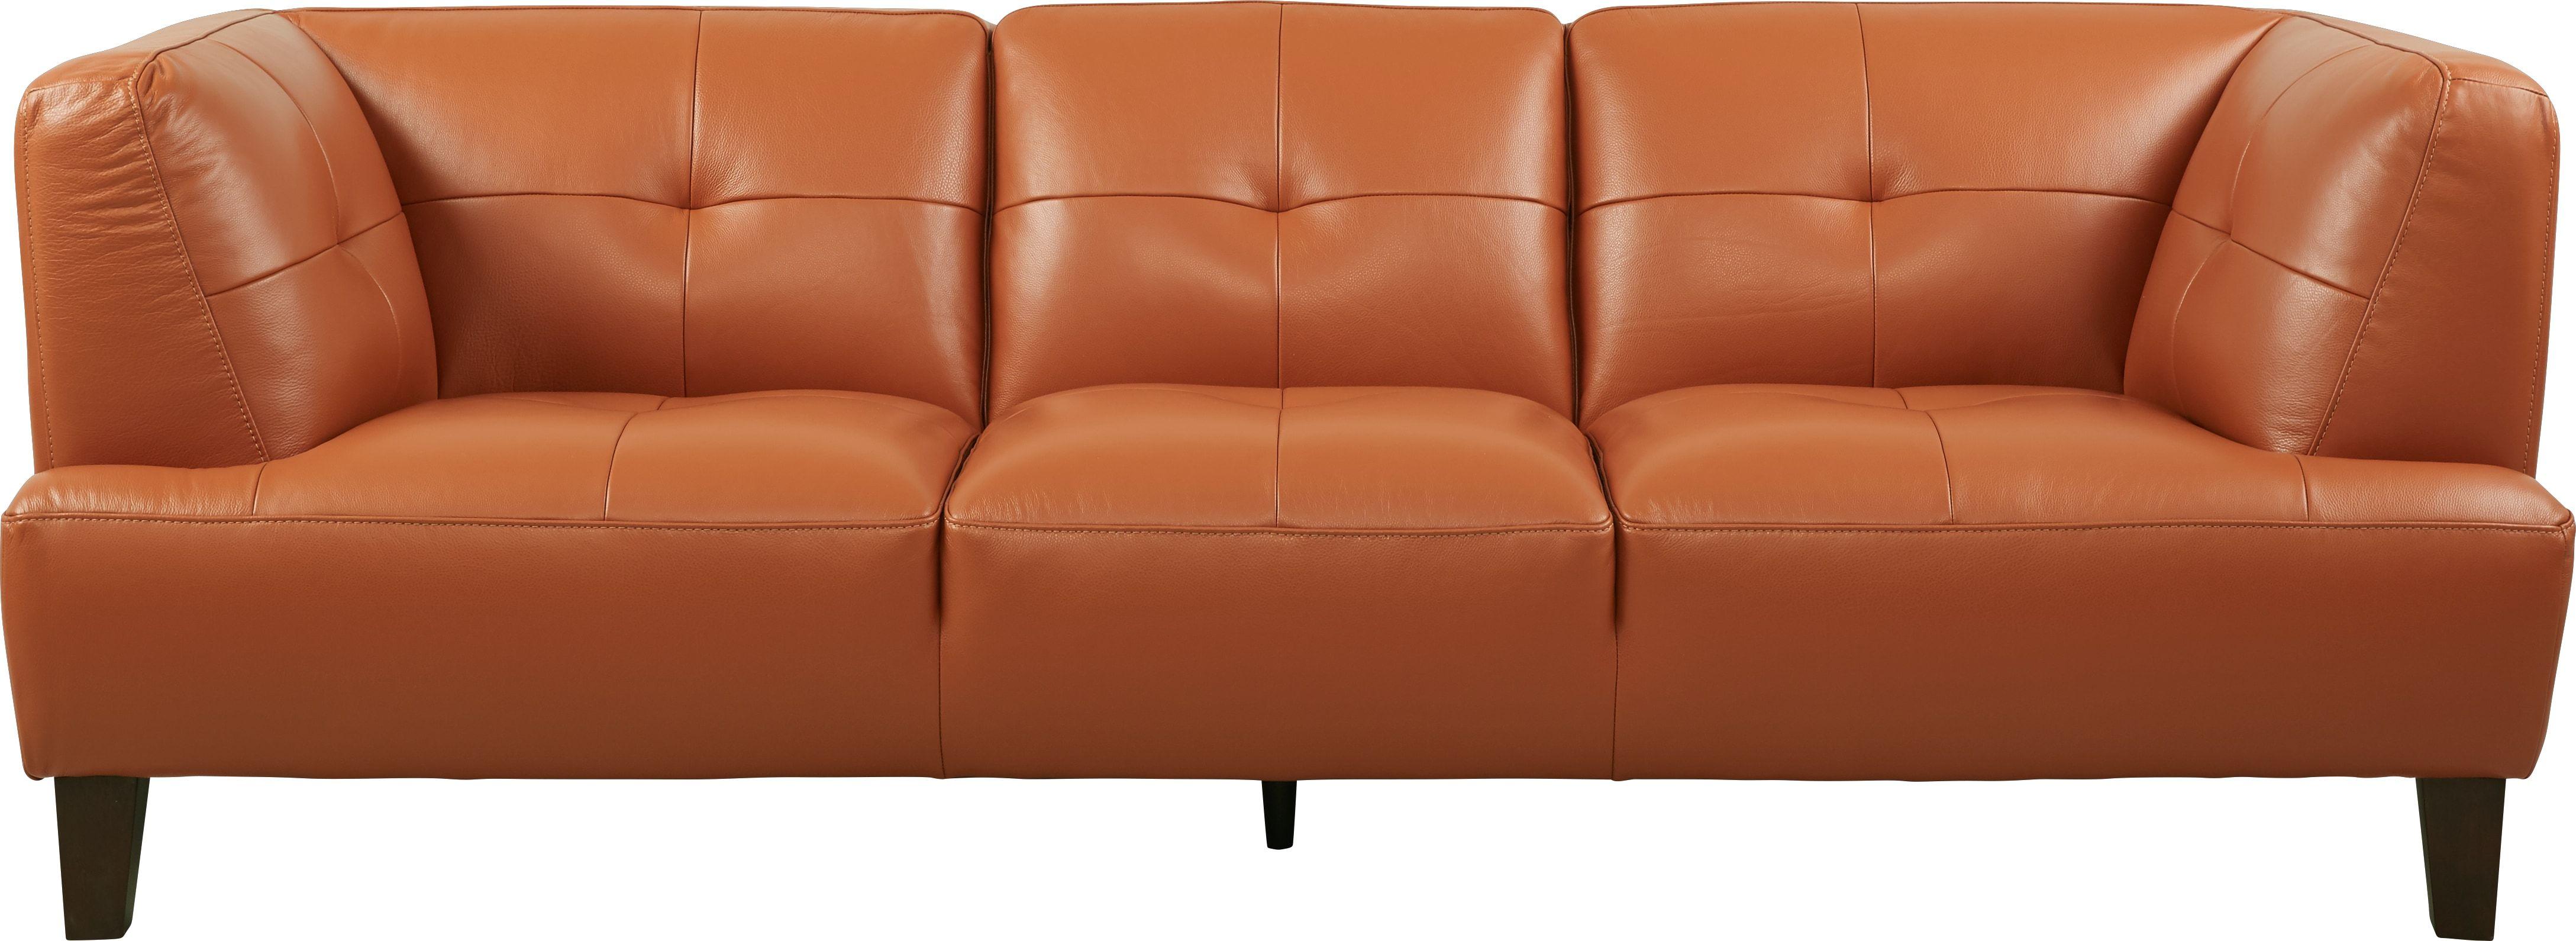 Villa Capri Orange Leather Sofa | home ideas | Orange ...